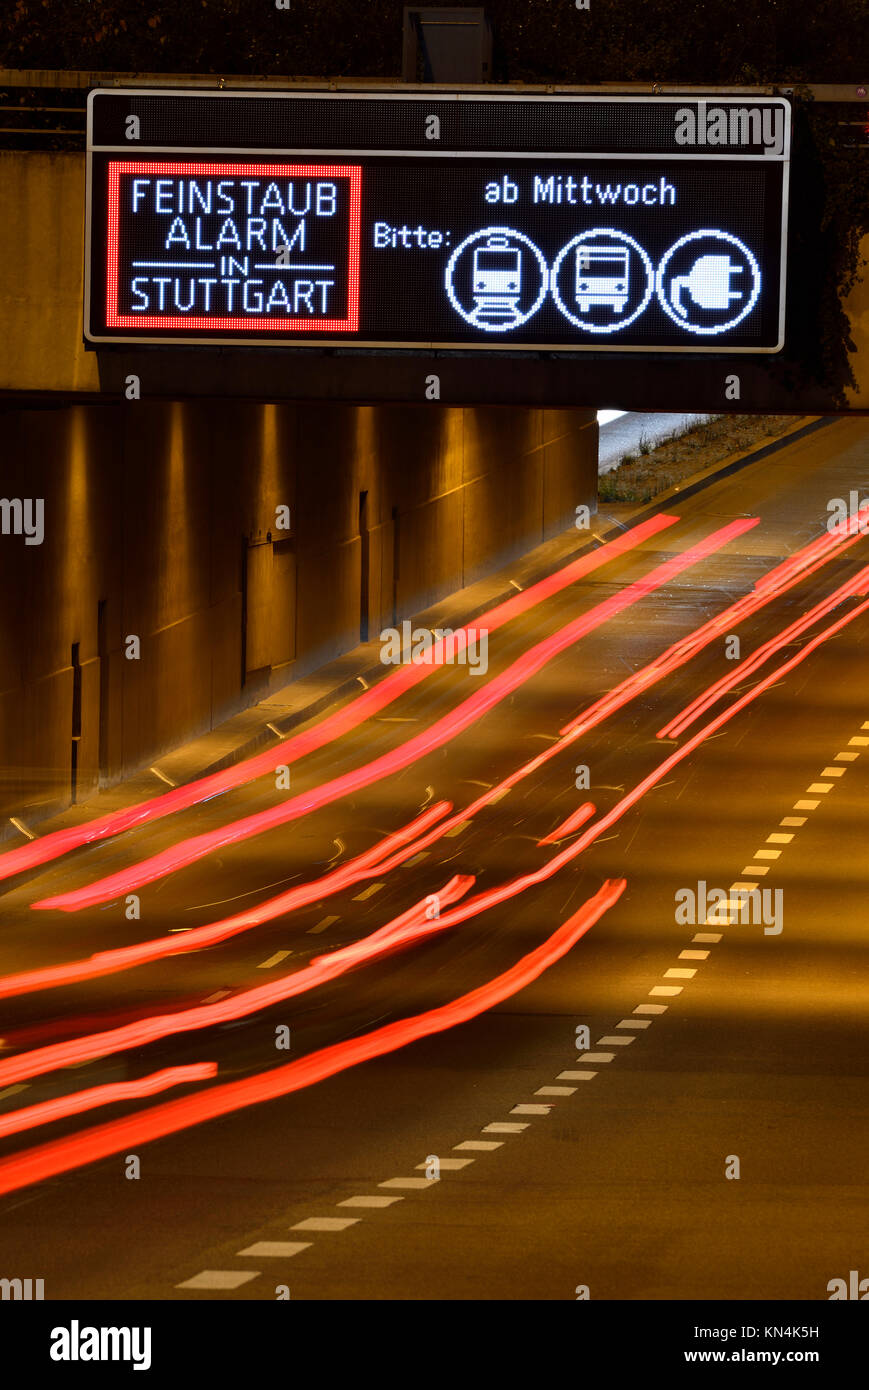 Information sign fine particles alarm on highway, light traces, Stuttgart, Baden-Württemberg, Germany - Stock Image